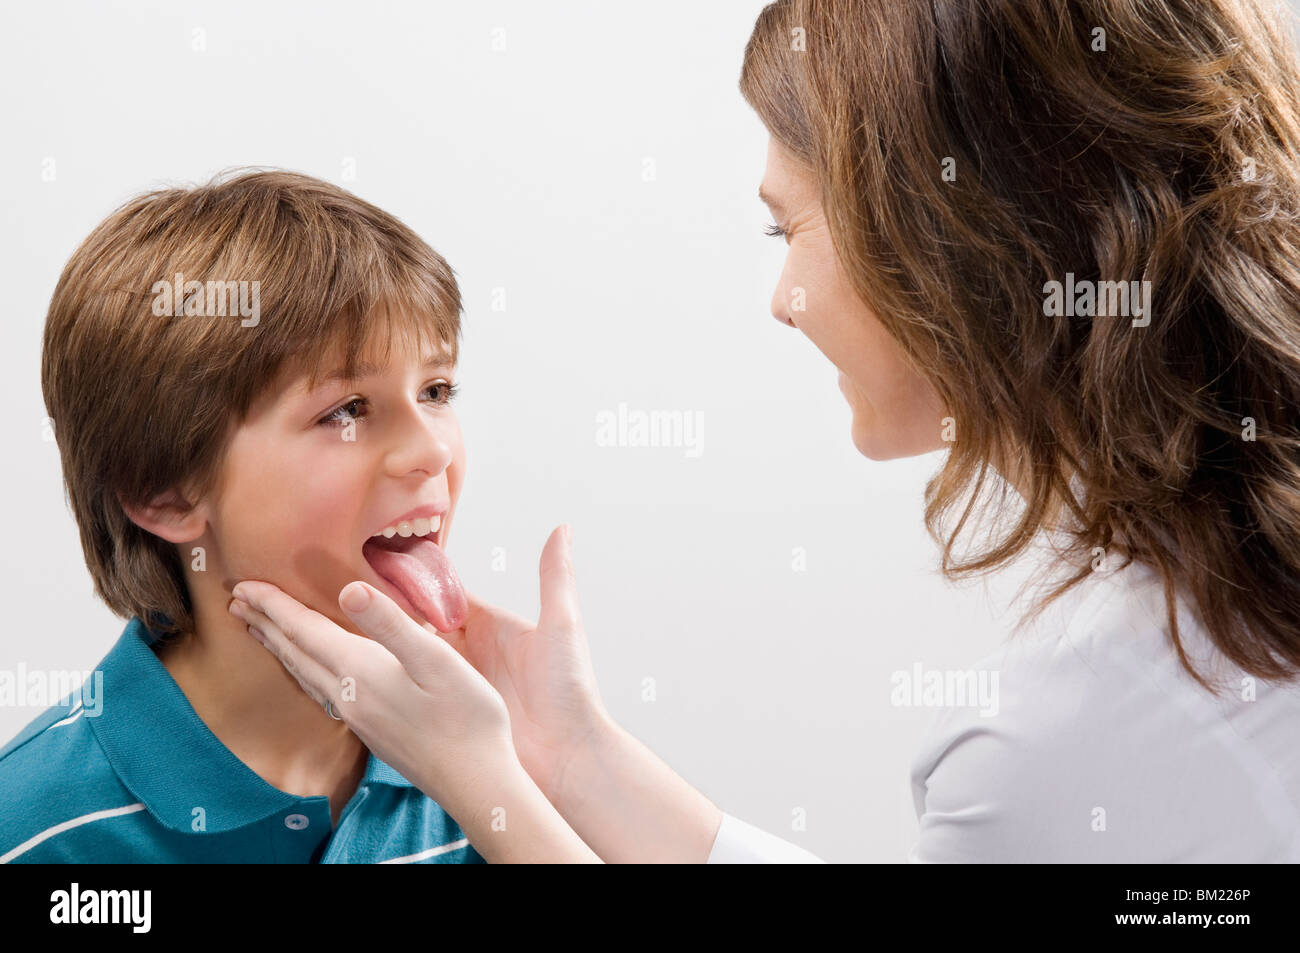 Female doctor examining a boy - Stock Image